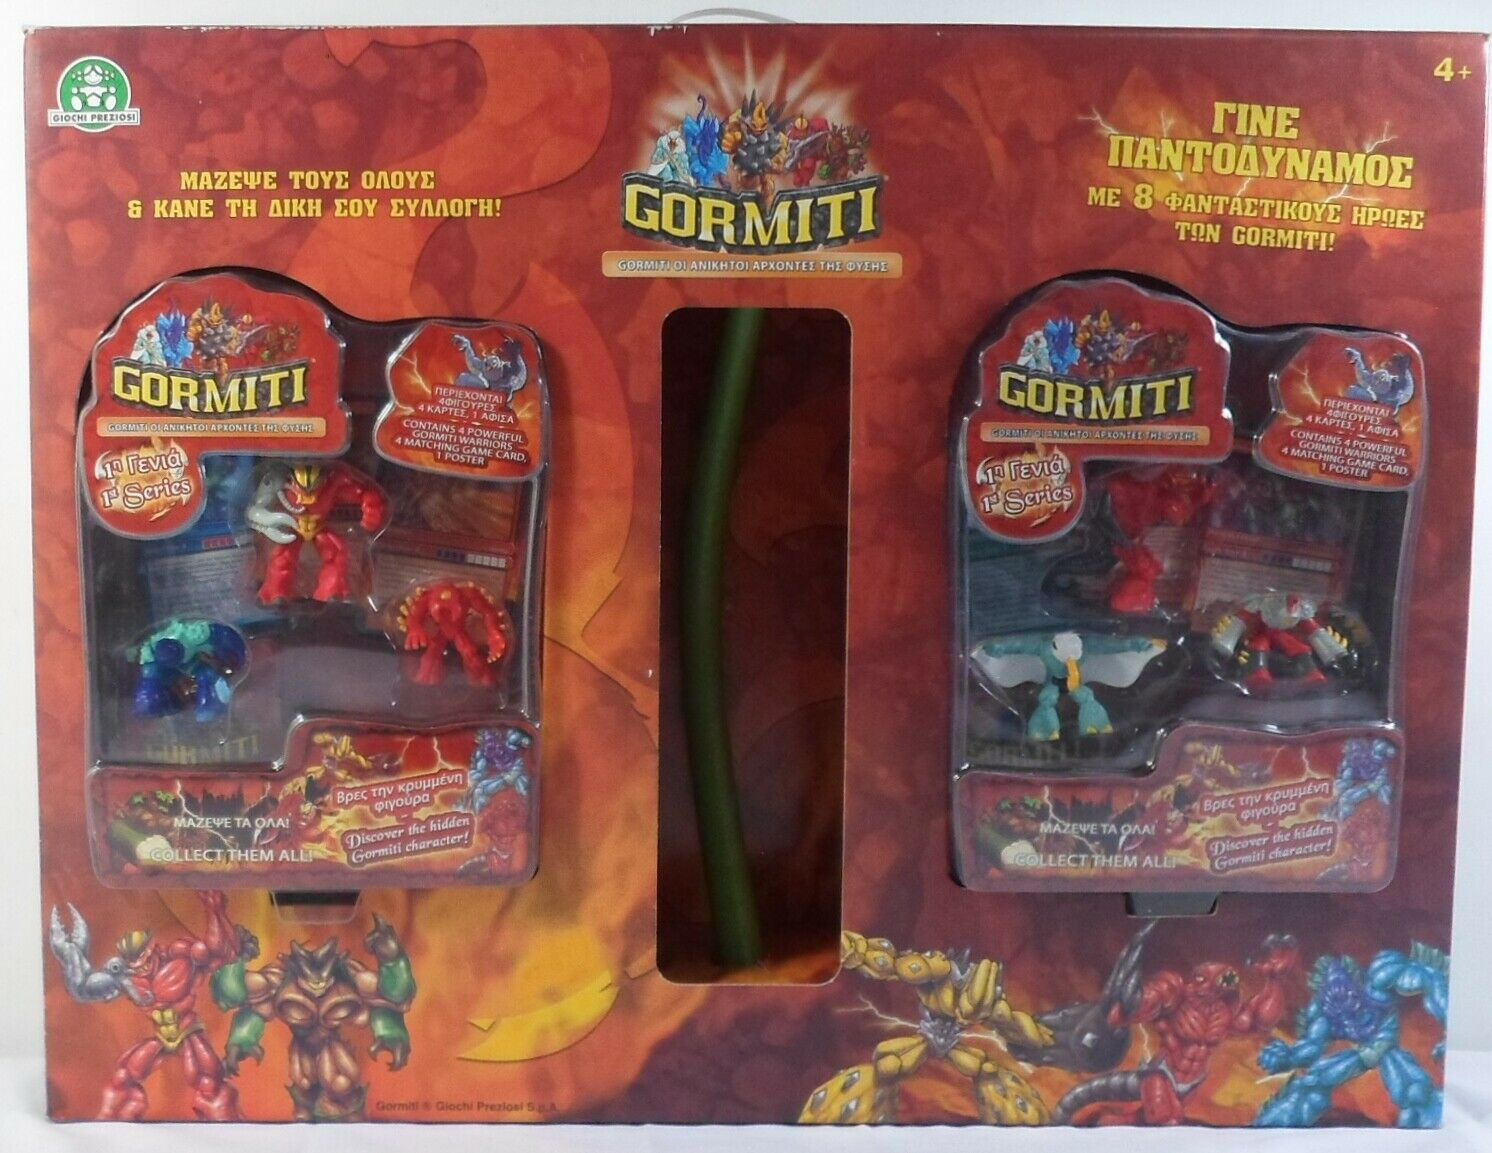 GORMITI 2007 EASTER CANDLE BOX w  2 x GORMITI SERIES 1 CARDS 8 FIGURES + CANDLE